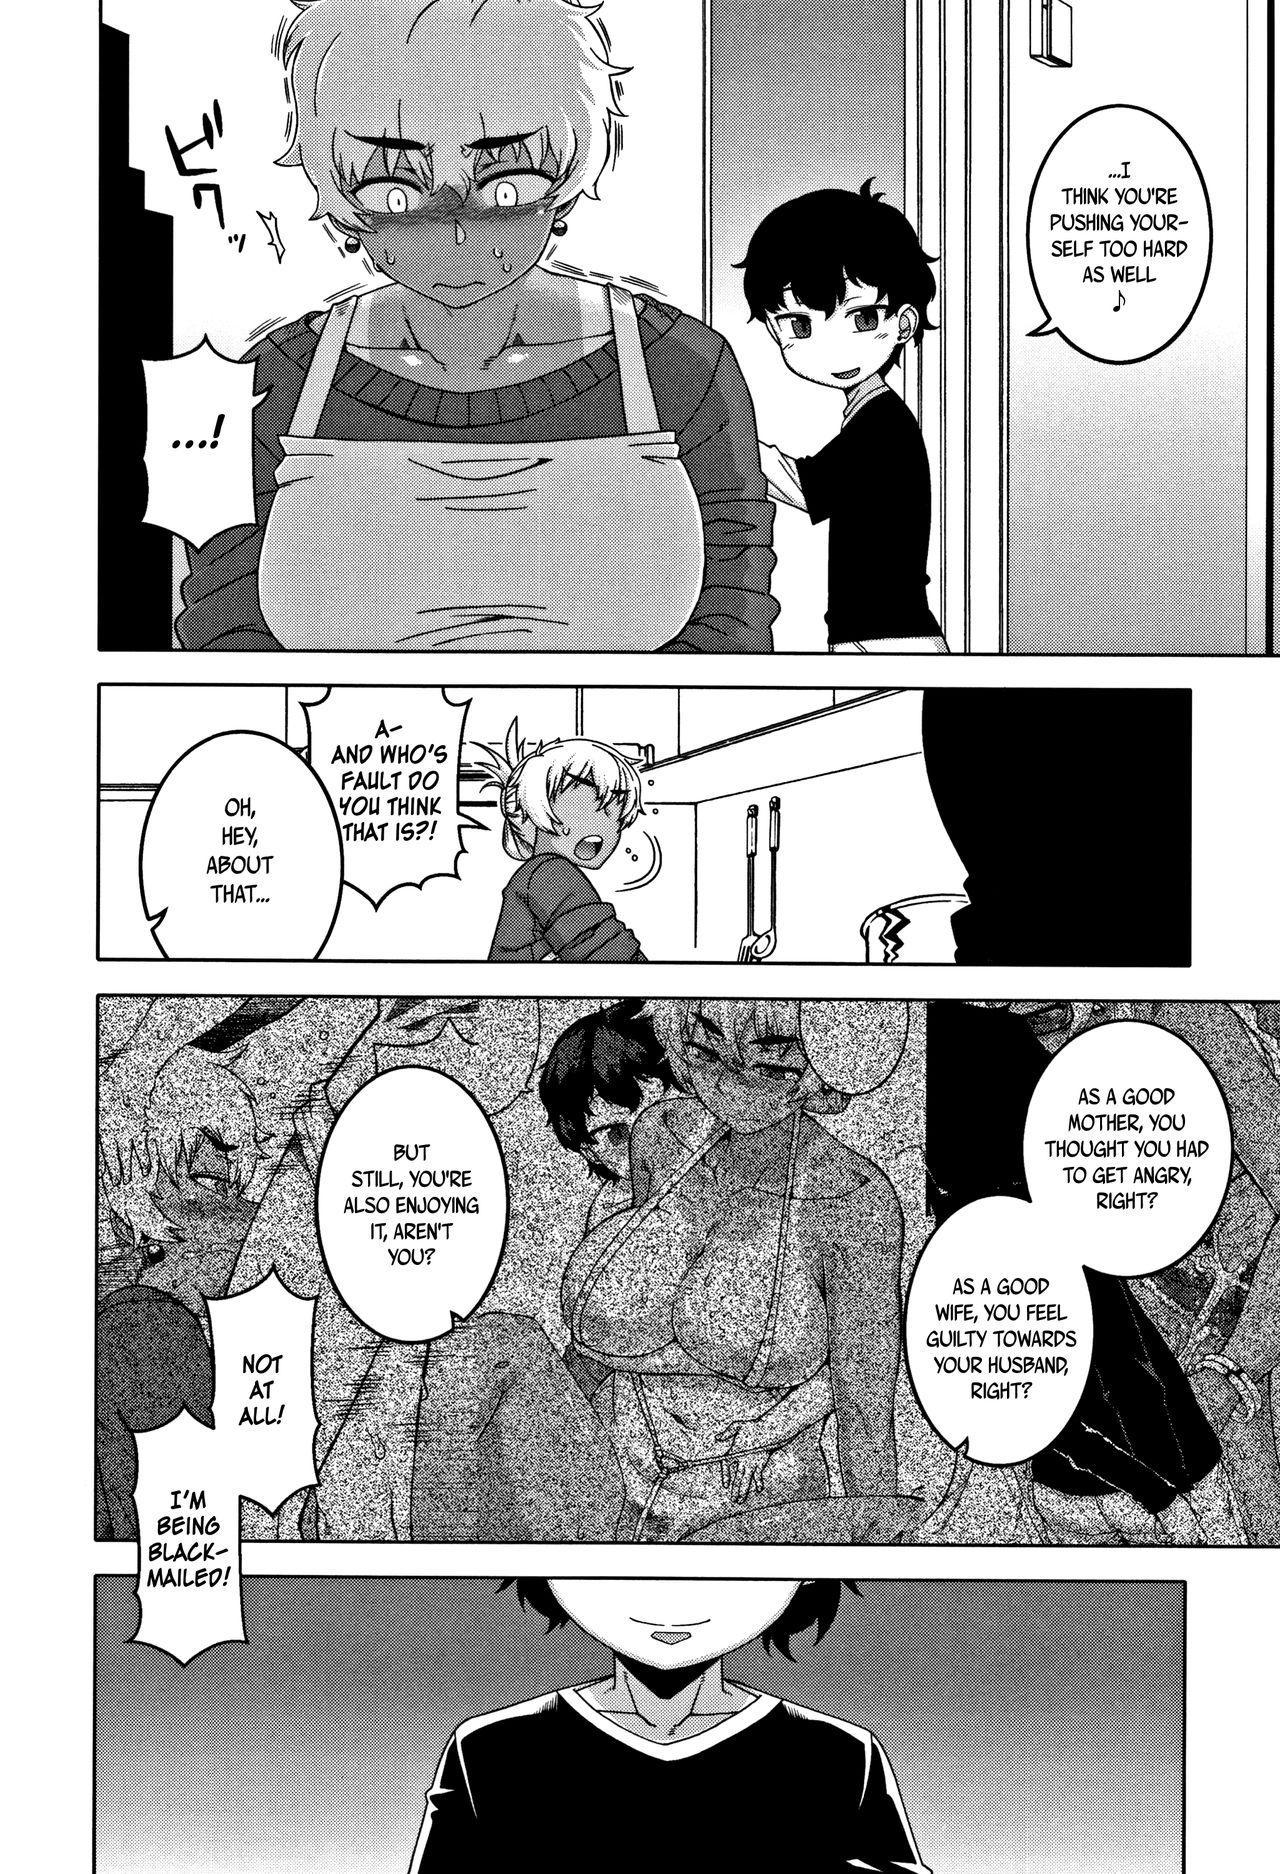 [Takatsu] Hitozuma A-san to Musuko no Yuujin N-kun - Married wife A and son's friend N-kun [English] 151